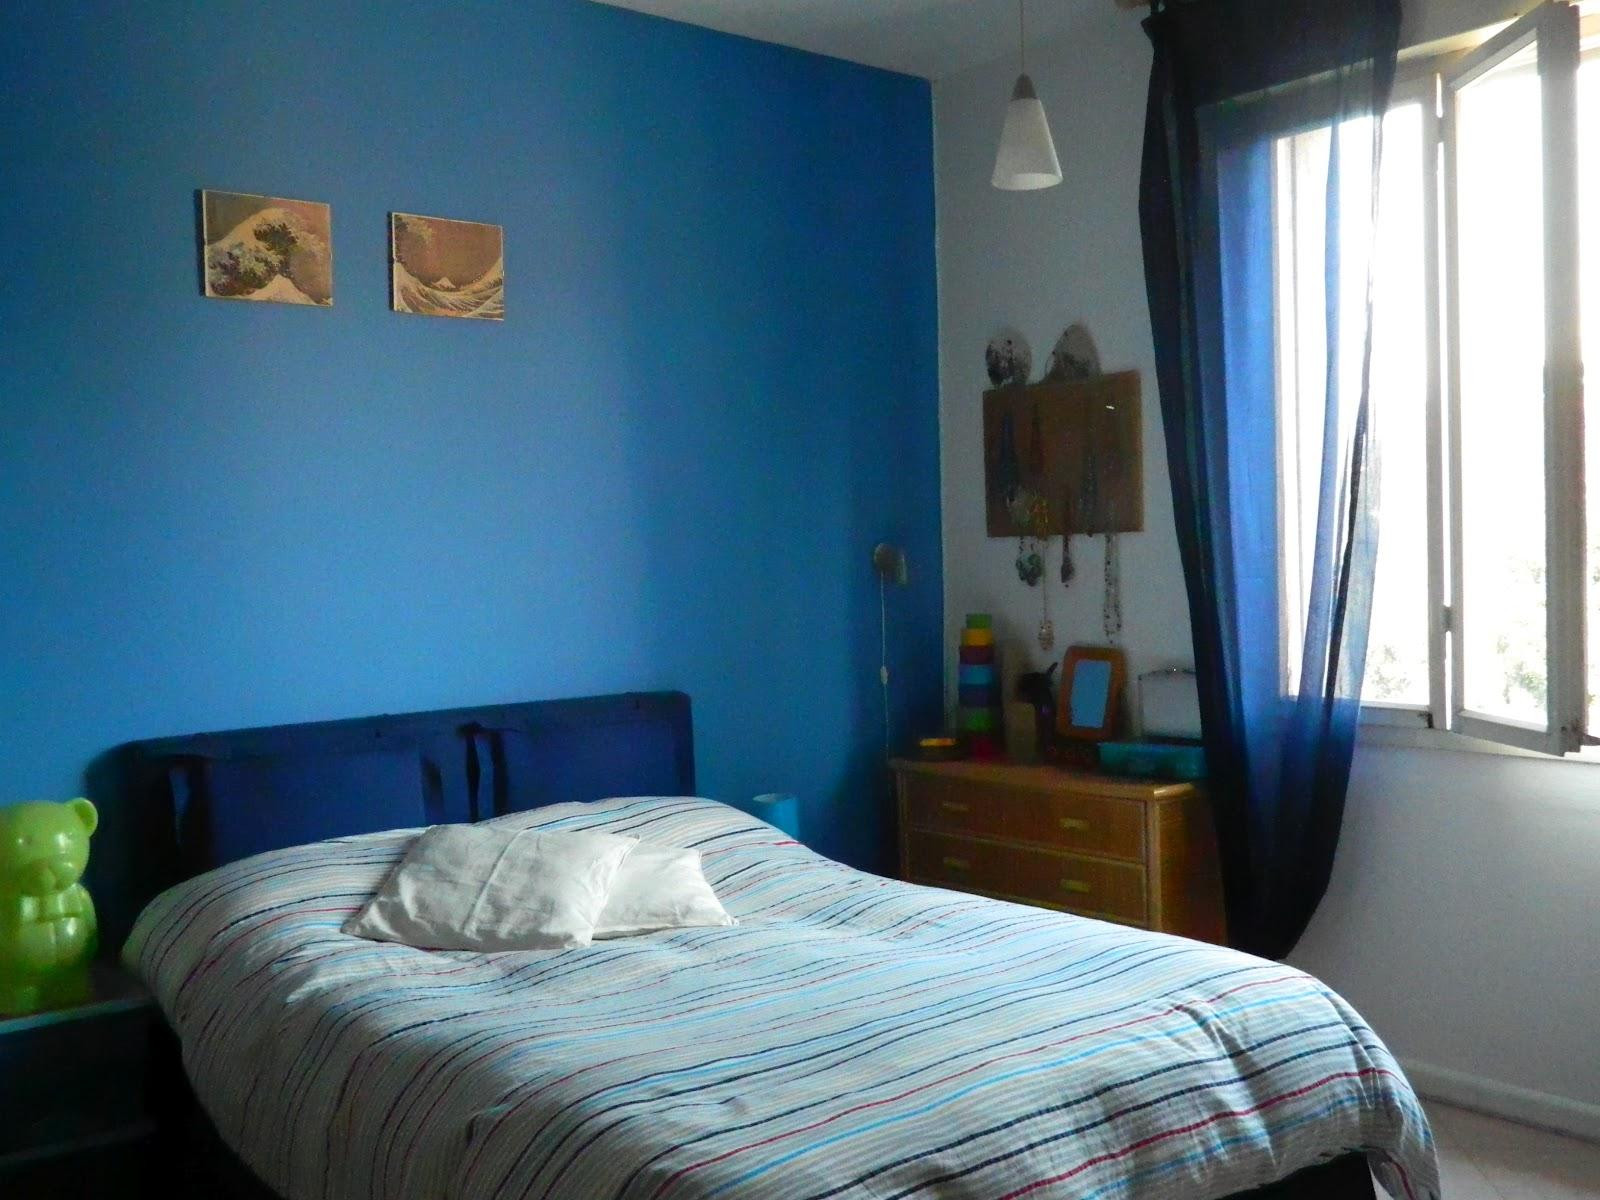 ViaSmeraldoBologna: Camera da letto